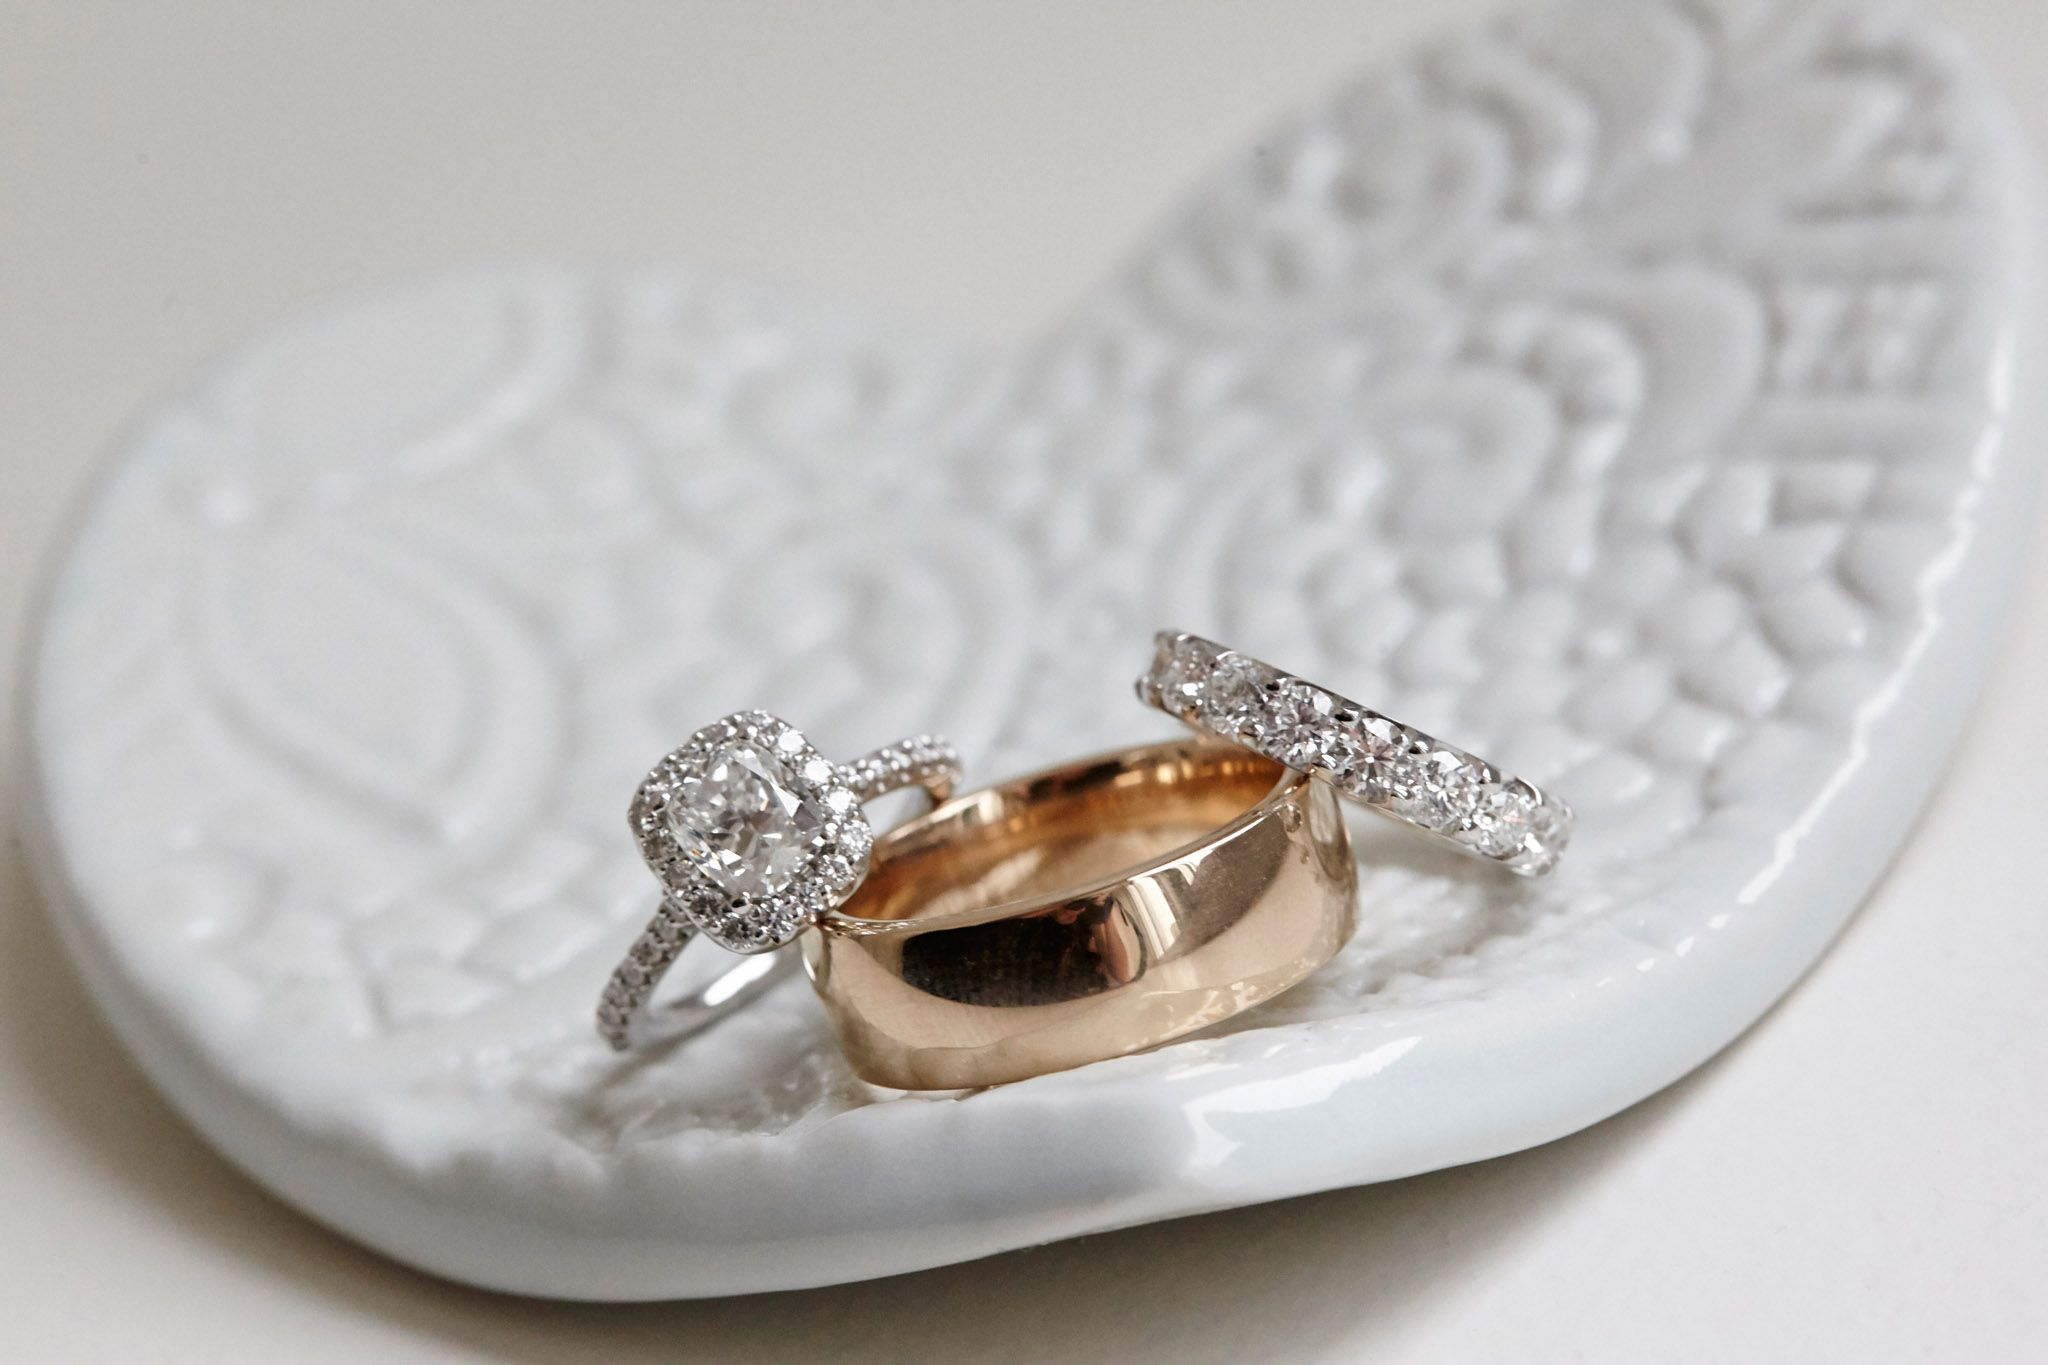 Opulent Wedding With Organic Textures Elegant Decor In Chicago Inside Weddings Wedding Rings Wedding Inside Opulent Wedding